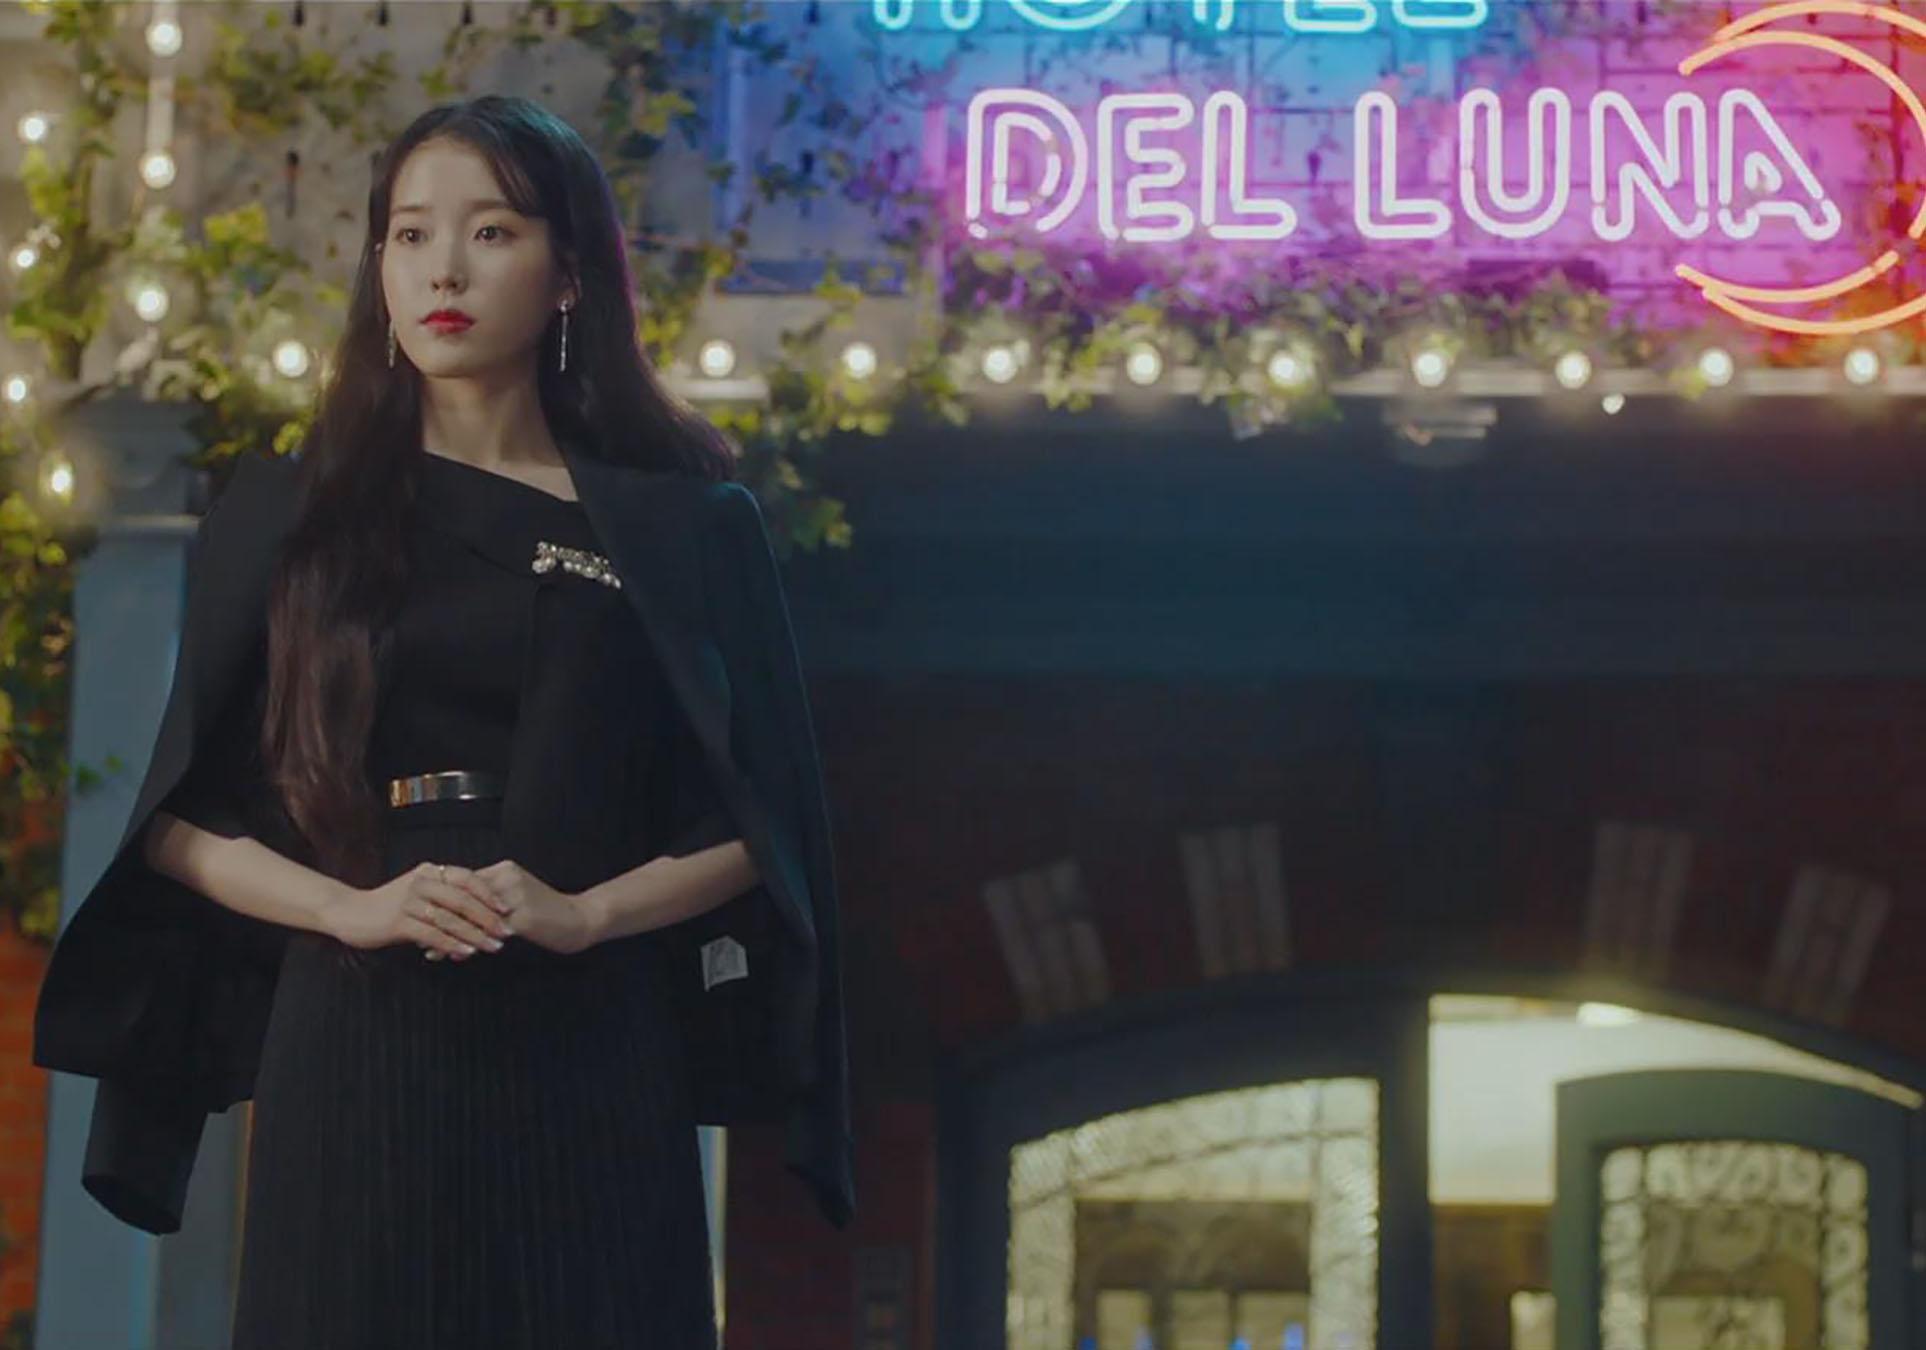 iu chân váy đen blazer đen hotel del luna